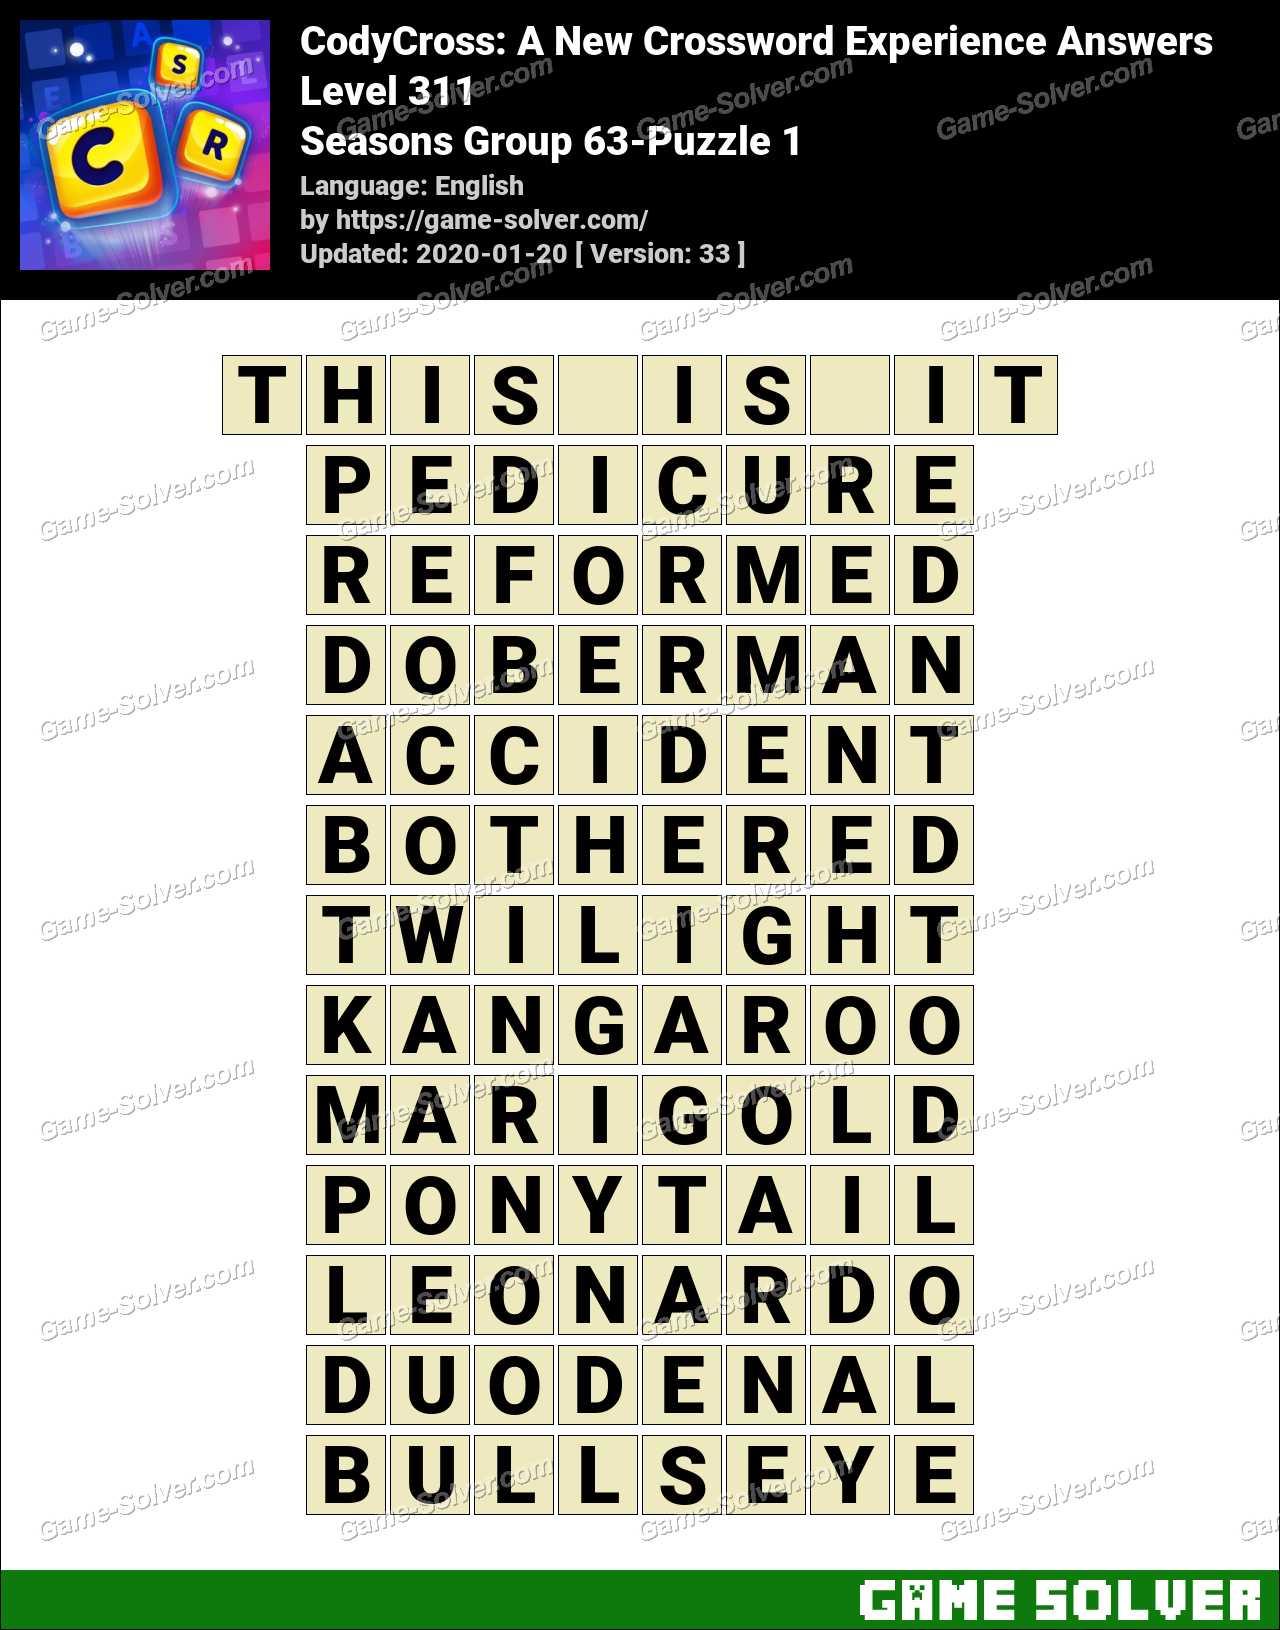 CodyCross Seasons Group 63-Puzzle 1 Answers